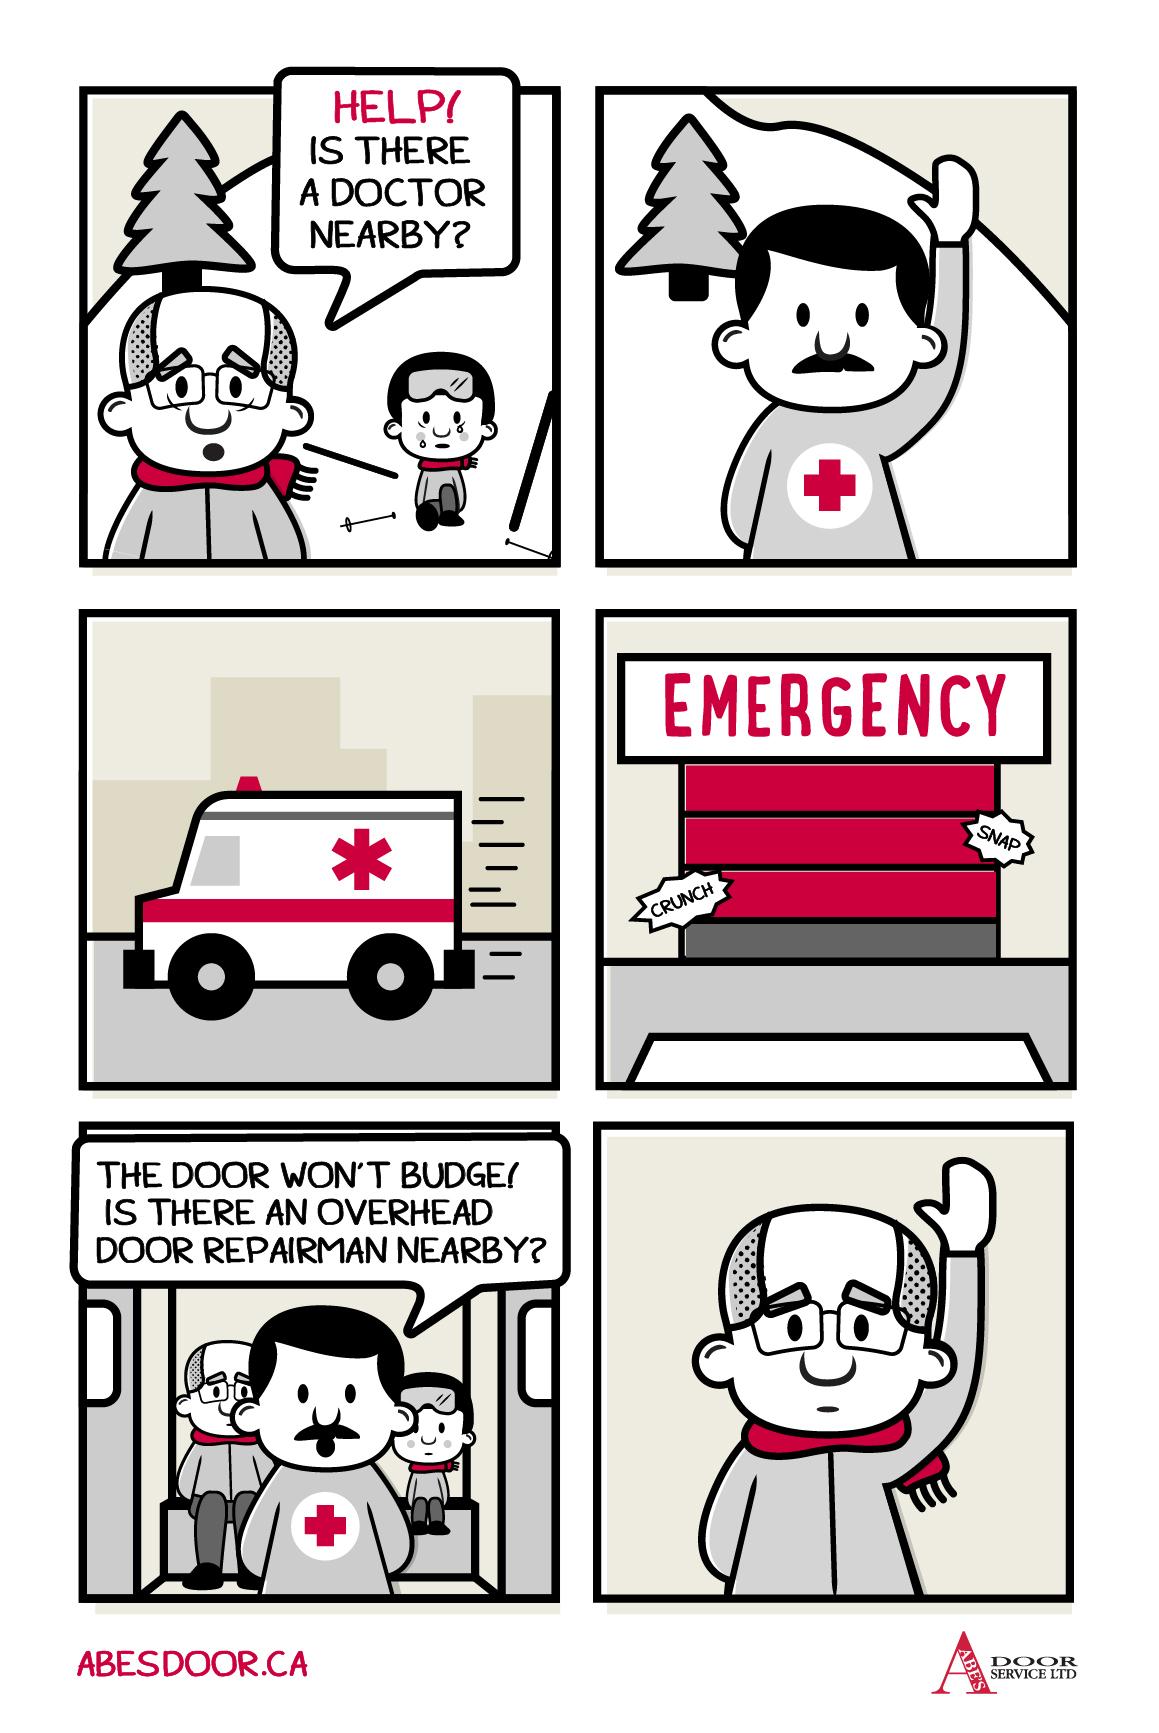 Hospital Overhead Garage Web Comic| Edmonton, Alberta | Abe's Door